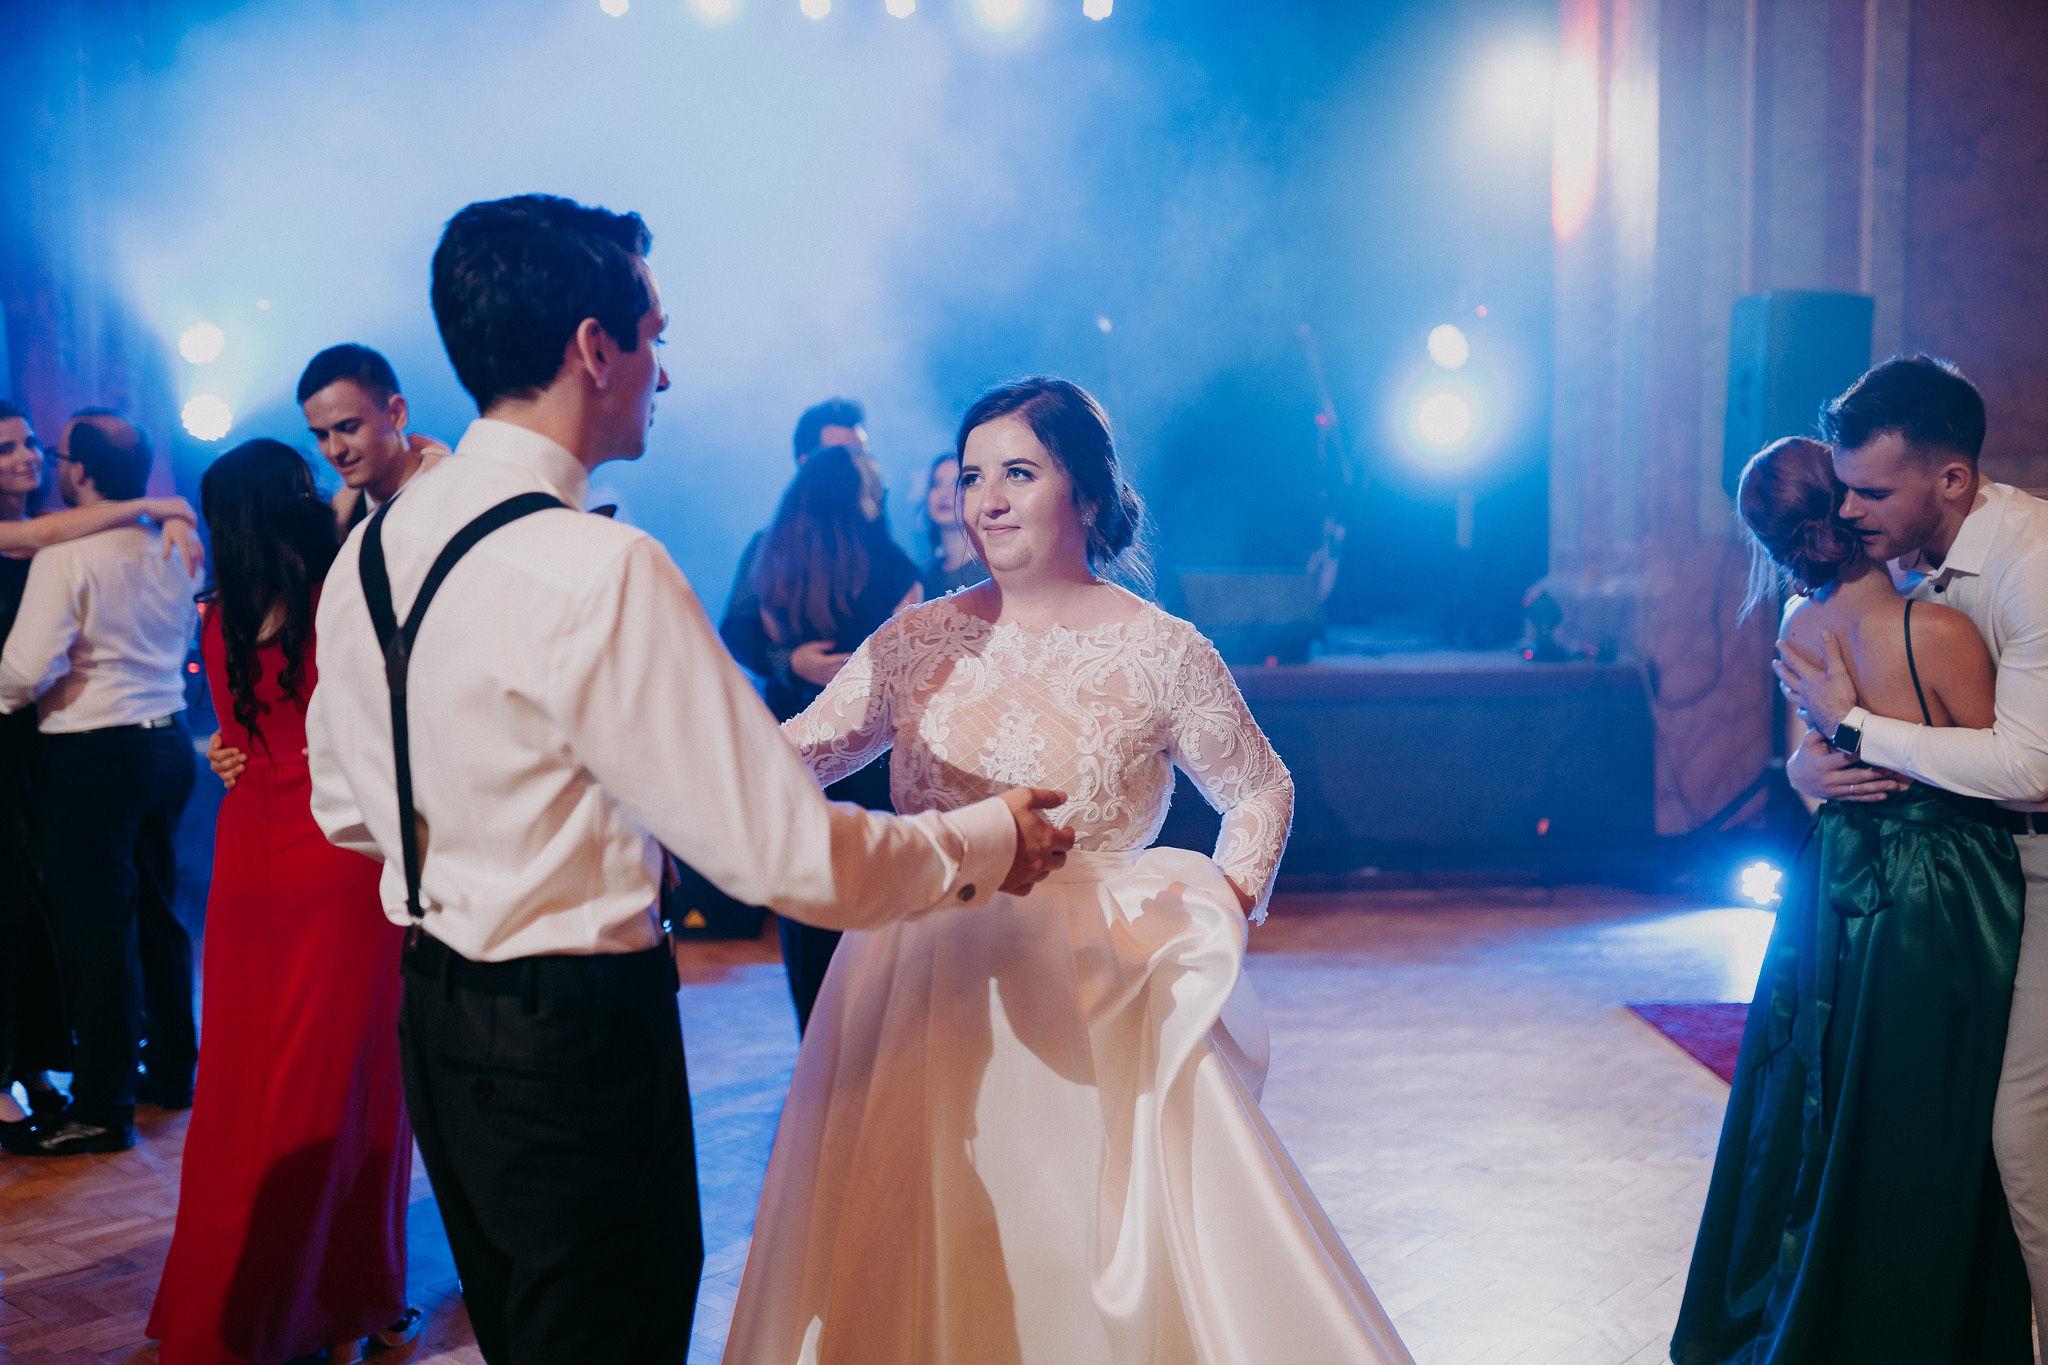 Svadba Hlohovec, Empirove divadlo 01 #svadobnyDJ, #djanasvadbu, #svadba, #svadbahlohovec, #Hlohovec #DJAnavi, #empirovedivadlo